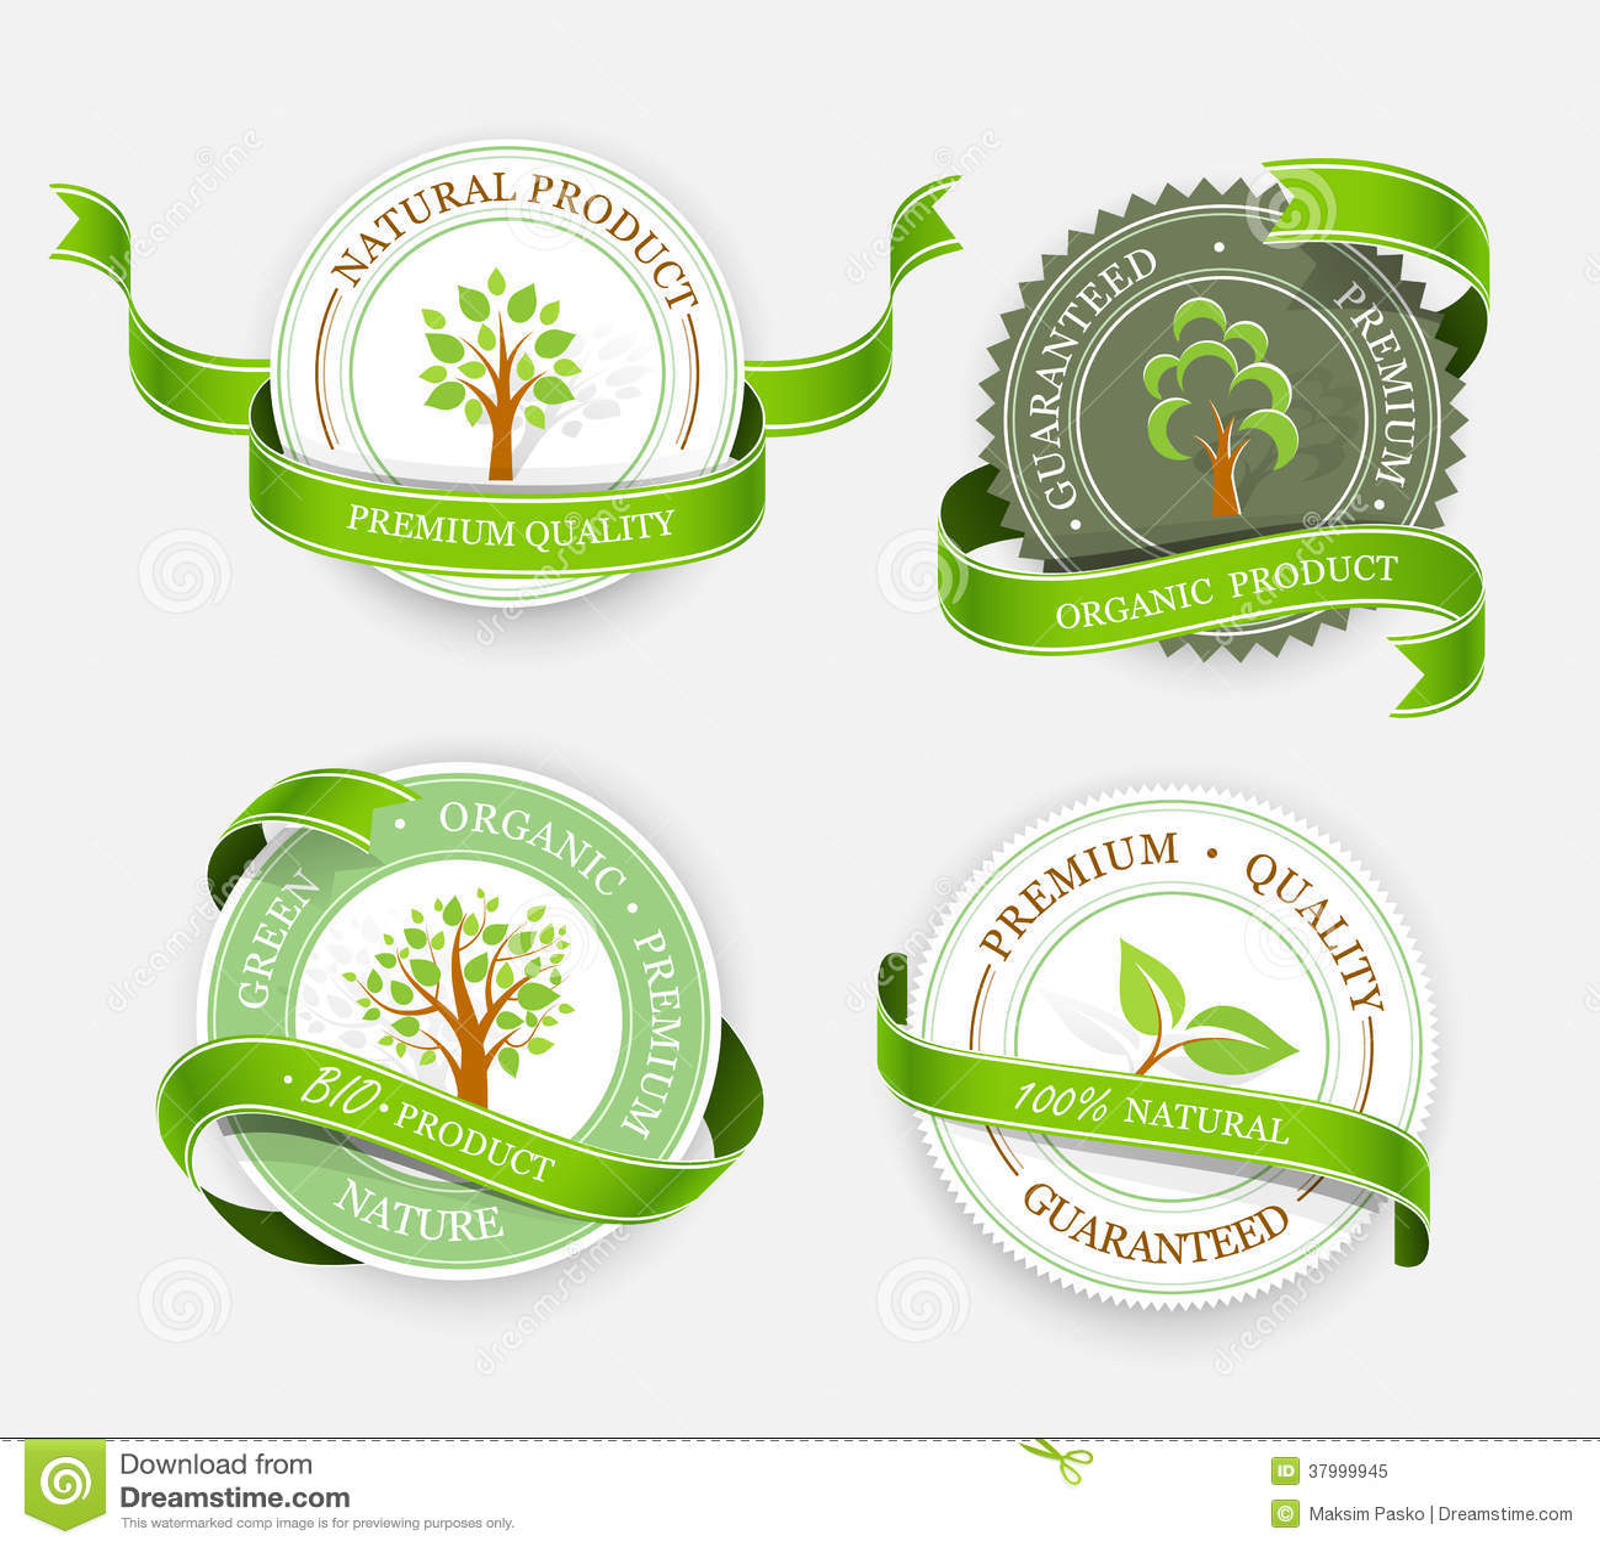 Inzameling van groene stickers